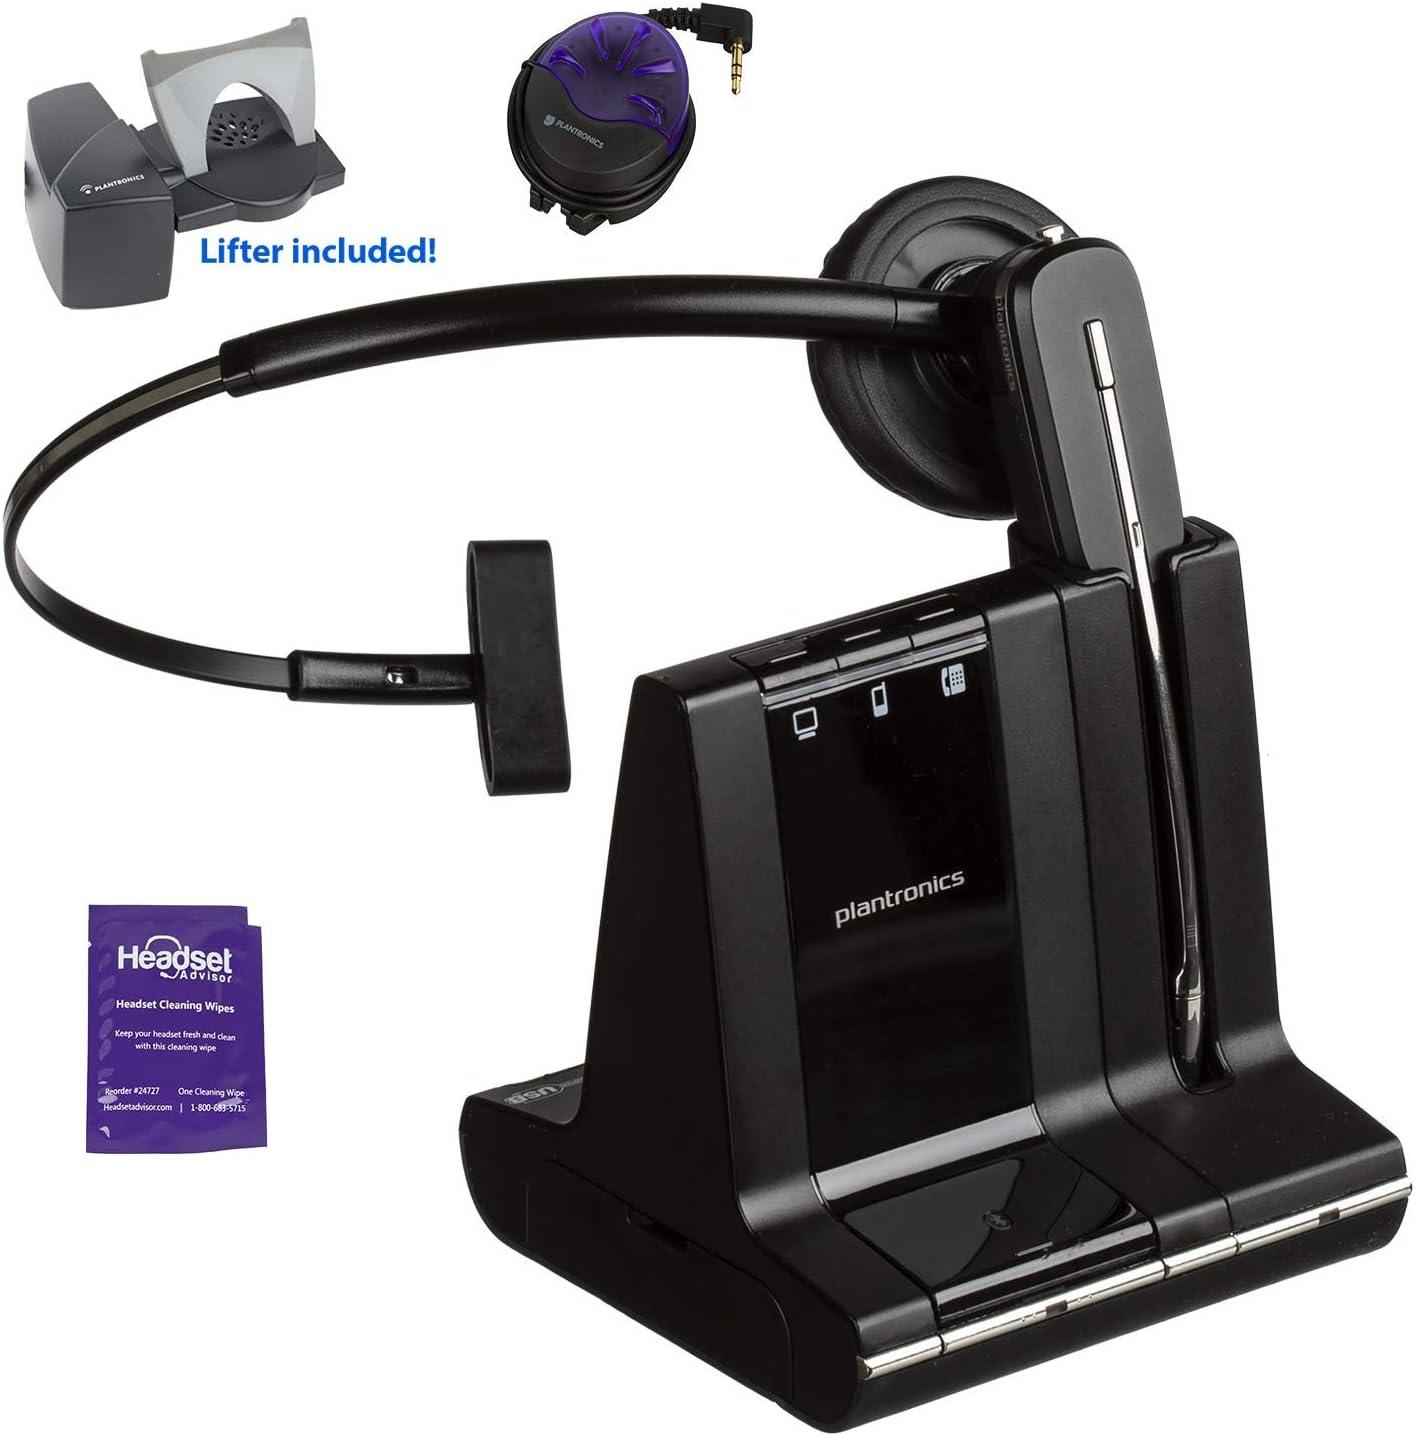 Renewed Plantronics-CS540 Convertible Wireless Headset with HL10 Handset Lifter